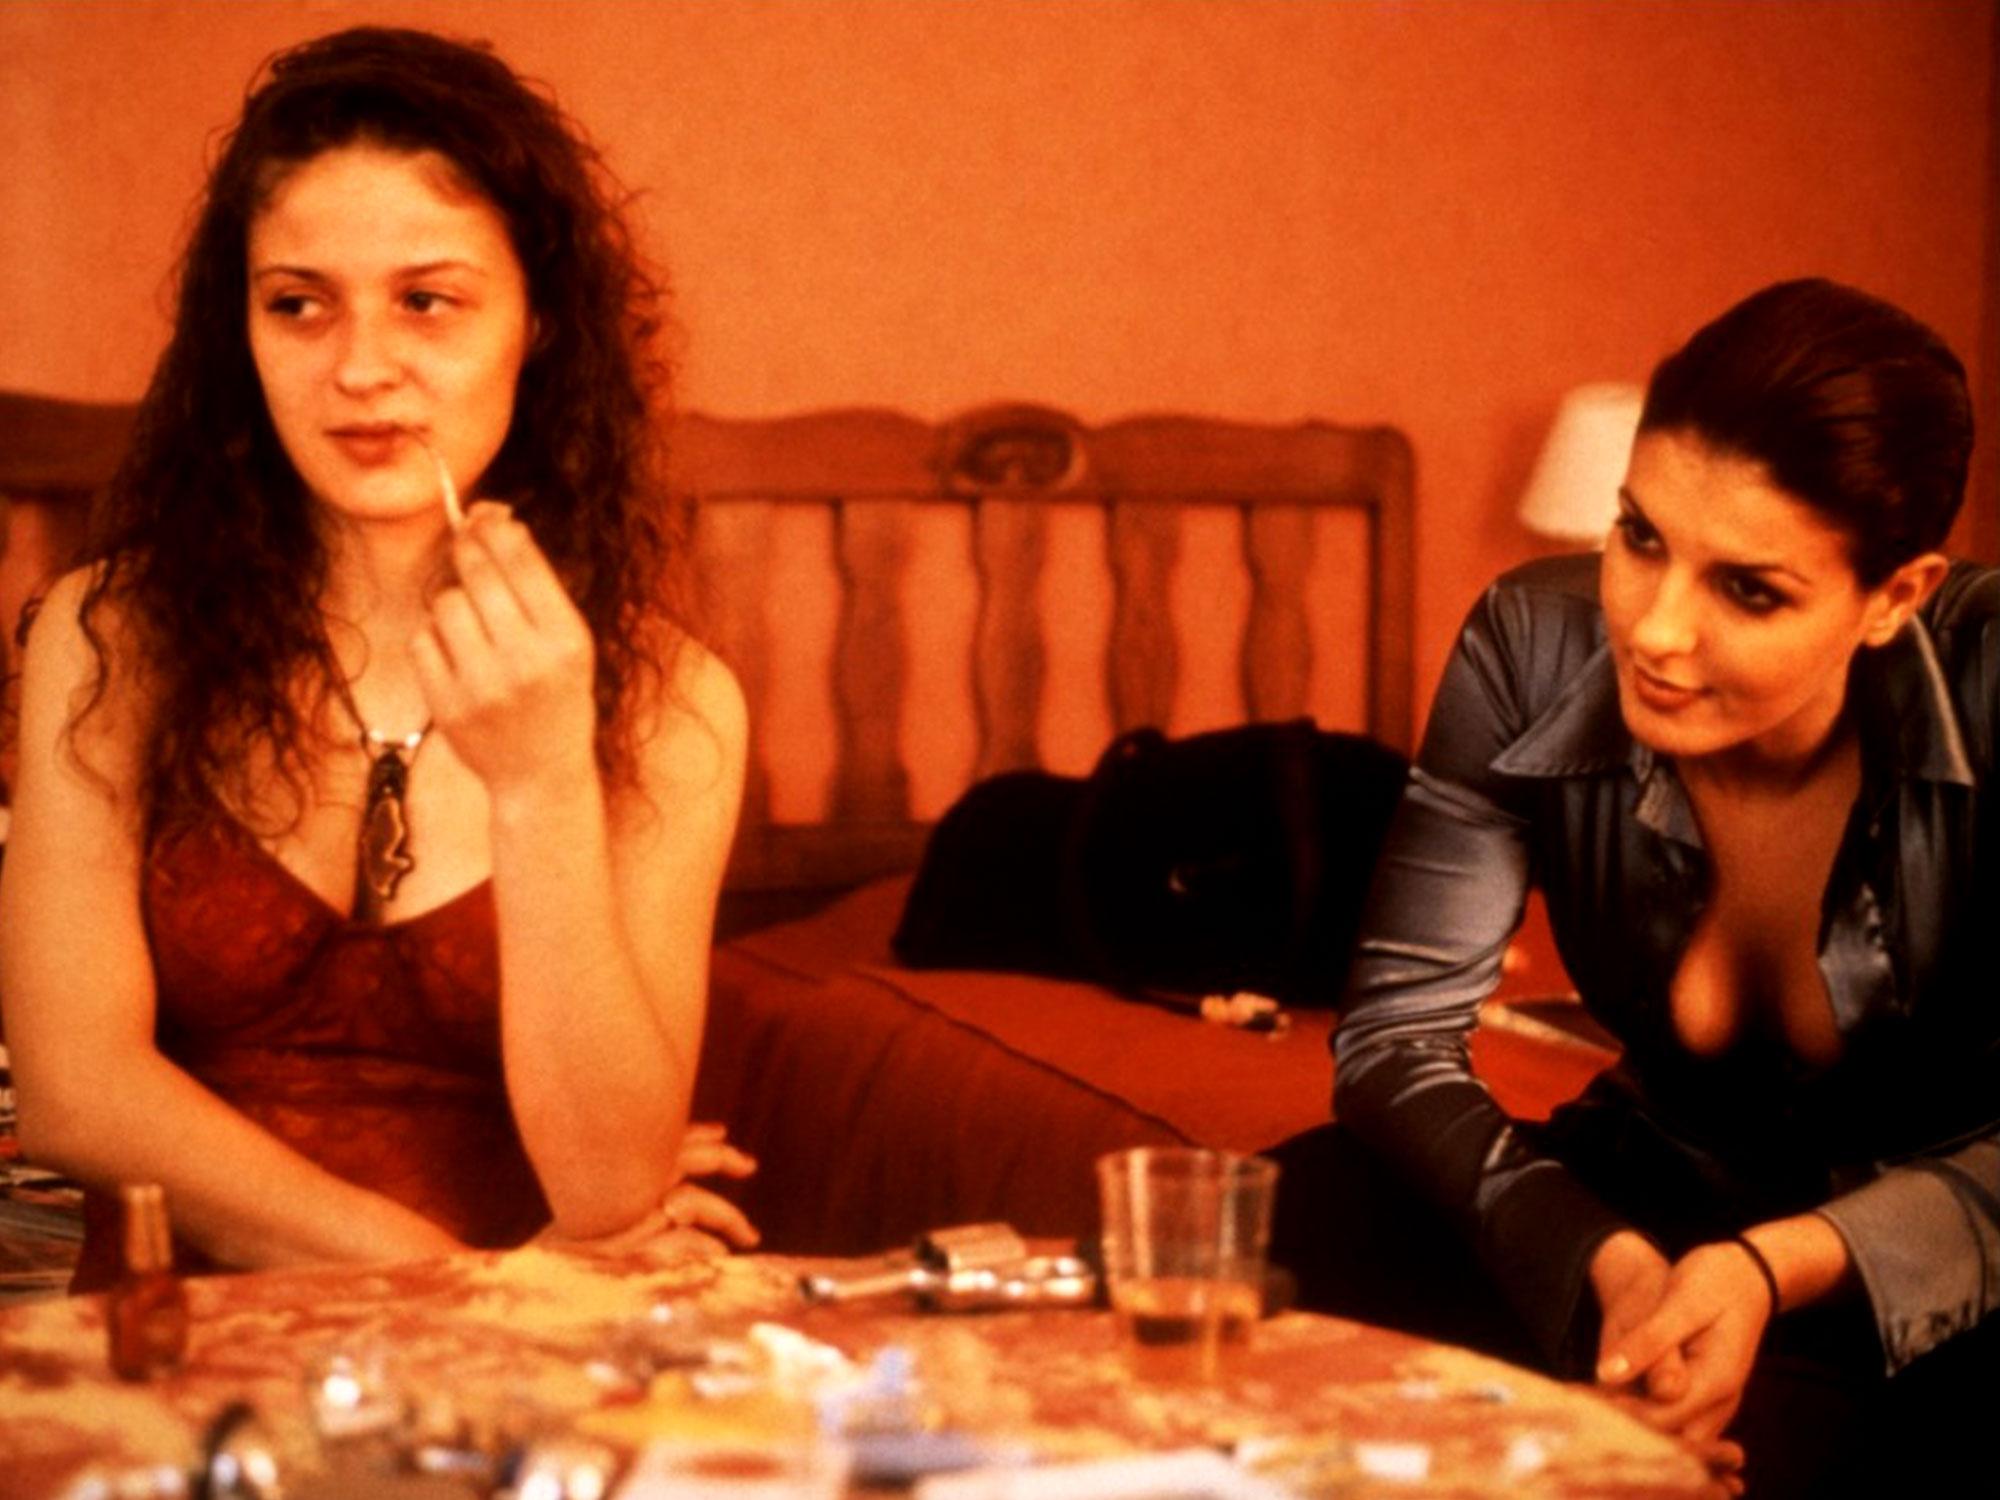 Karen Lancaume and Raffaëla Anderson in Baise-moi (2000)